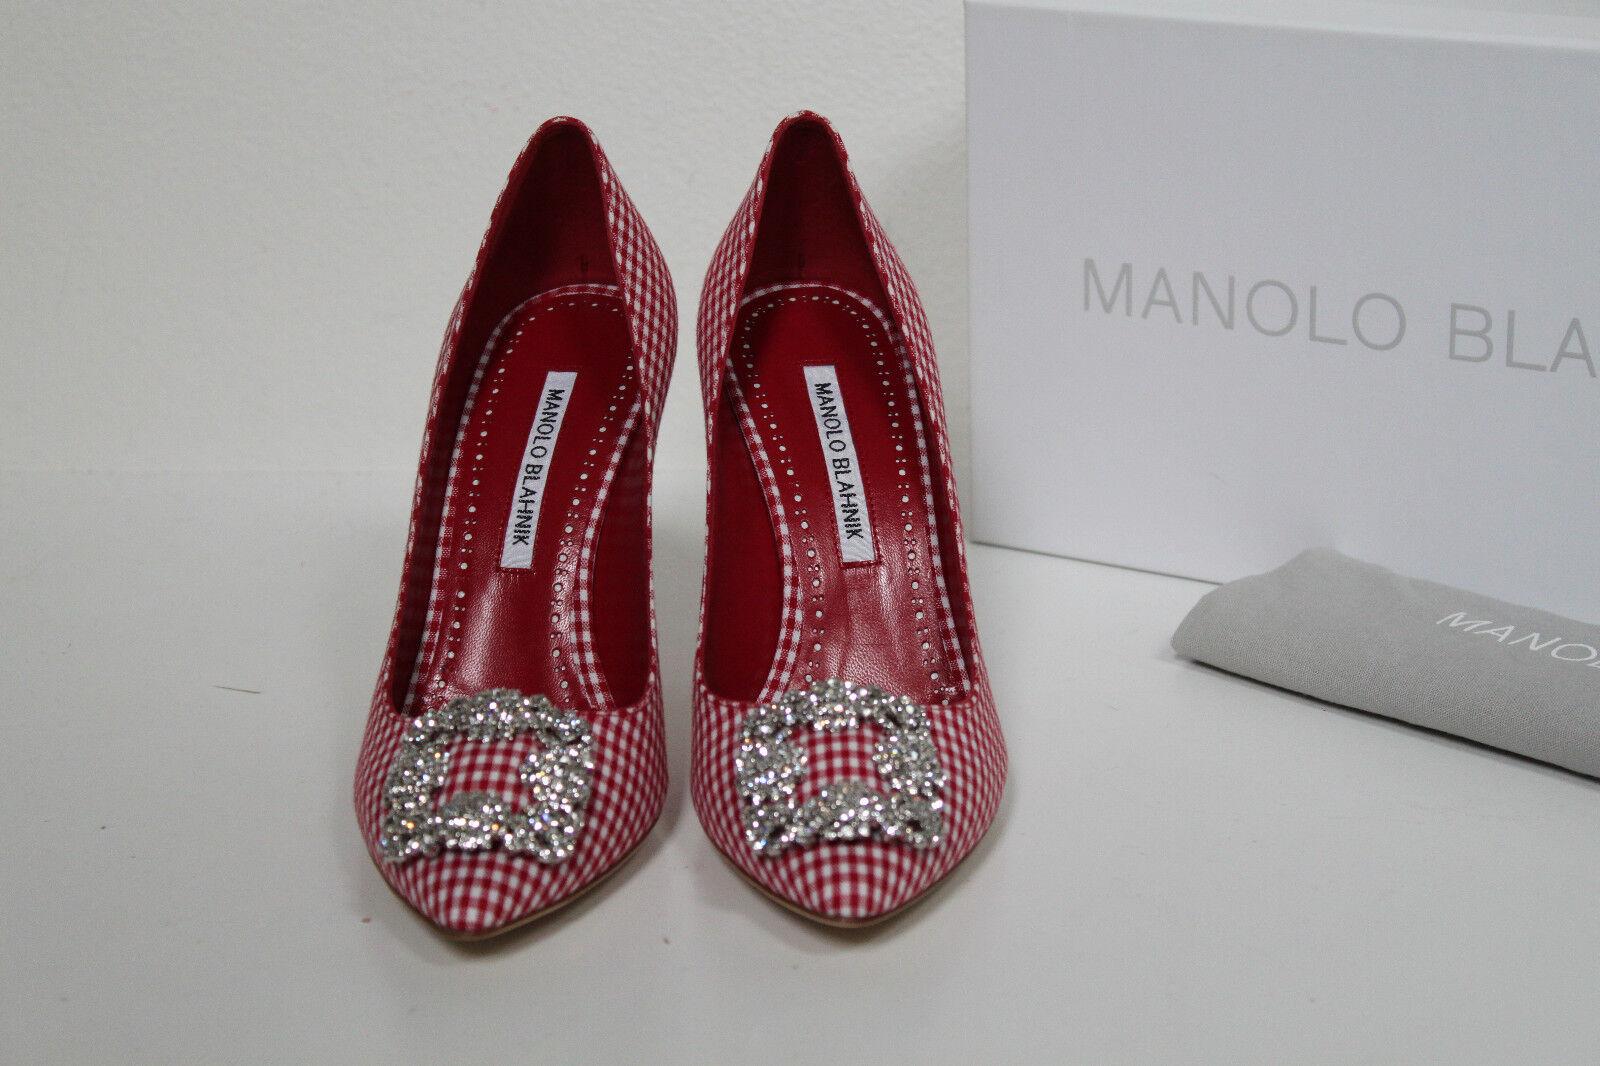 Sz 9   39 Manolo Blahnik Hangisi Gingham Crystal  Brook Jem Pump scarpe  prezzo all'ingrosso e qualità affidabile